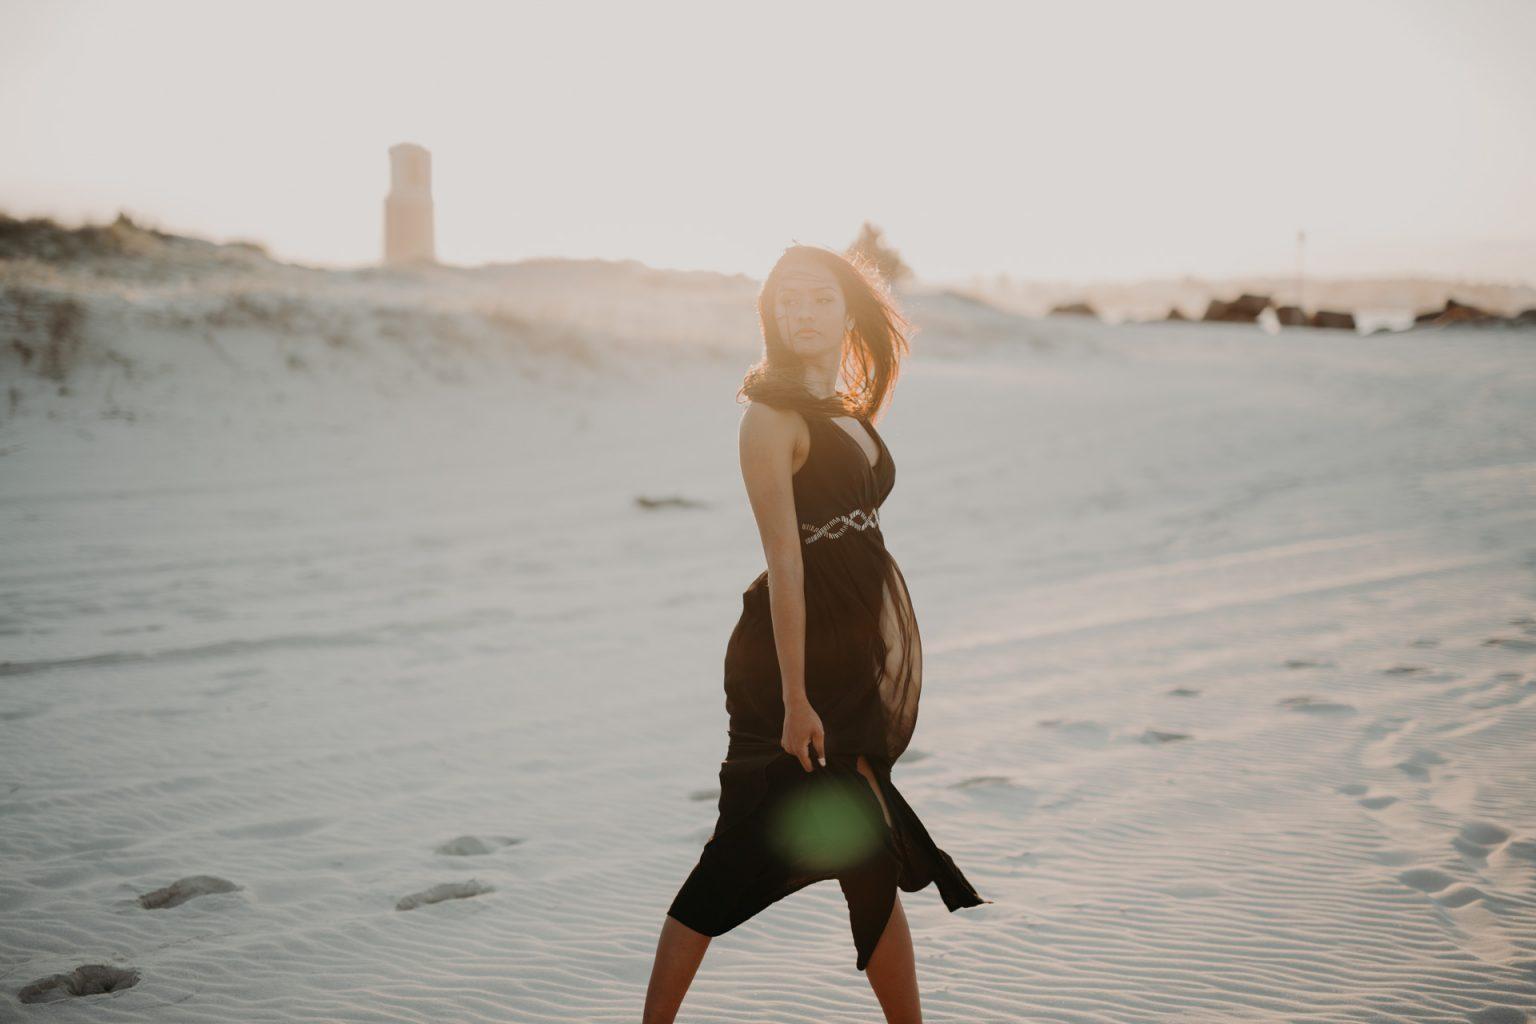 woman on beach windy hair brunette sun glare